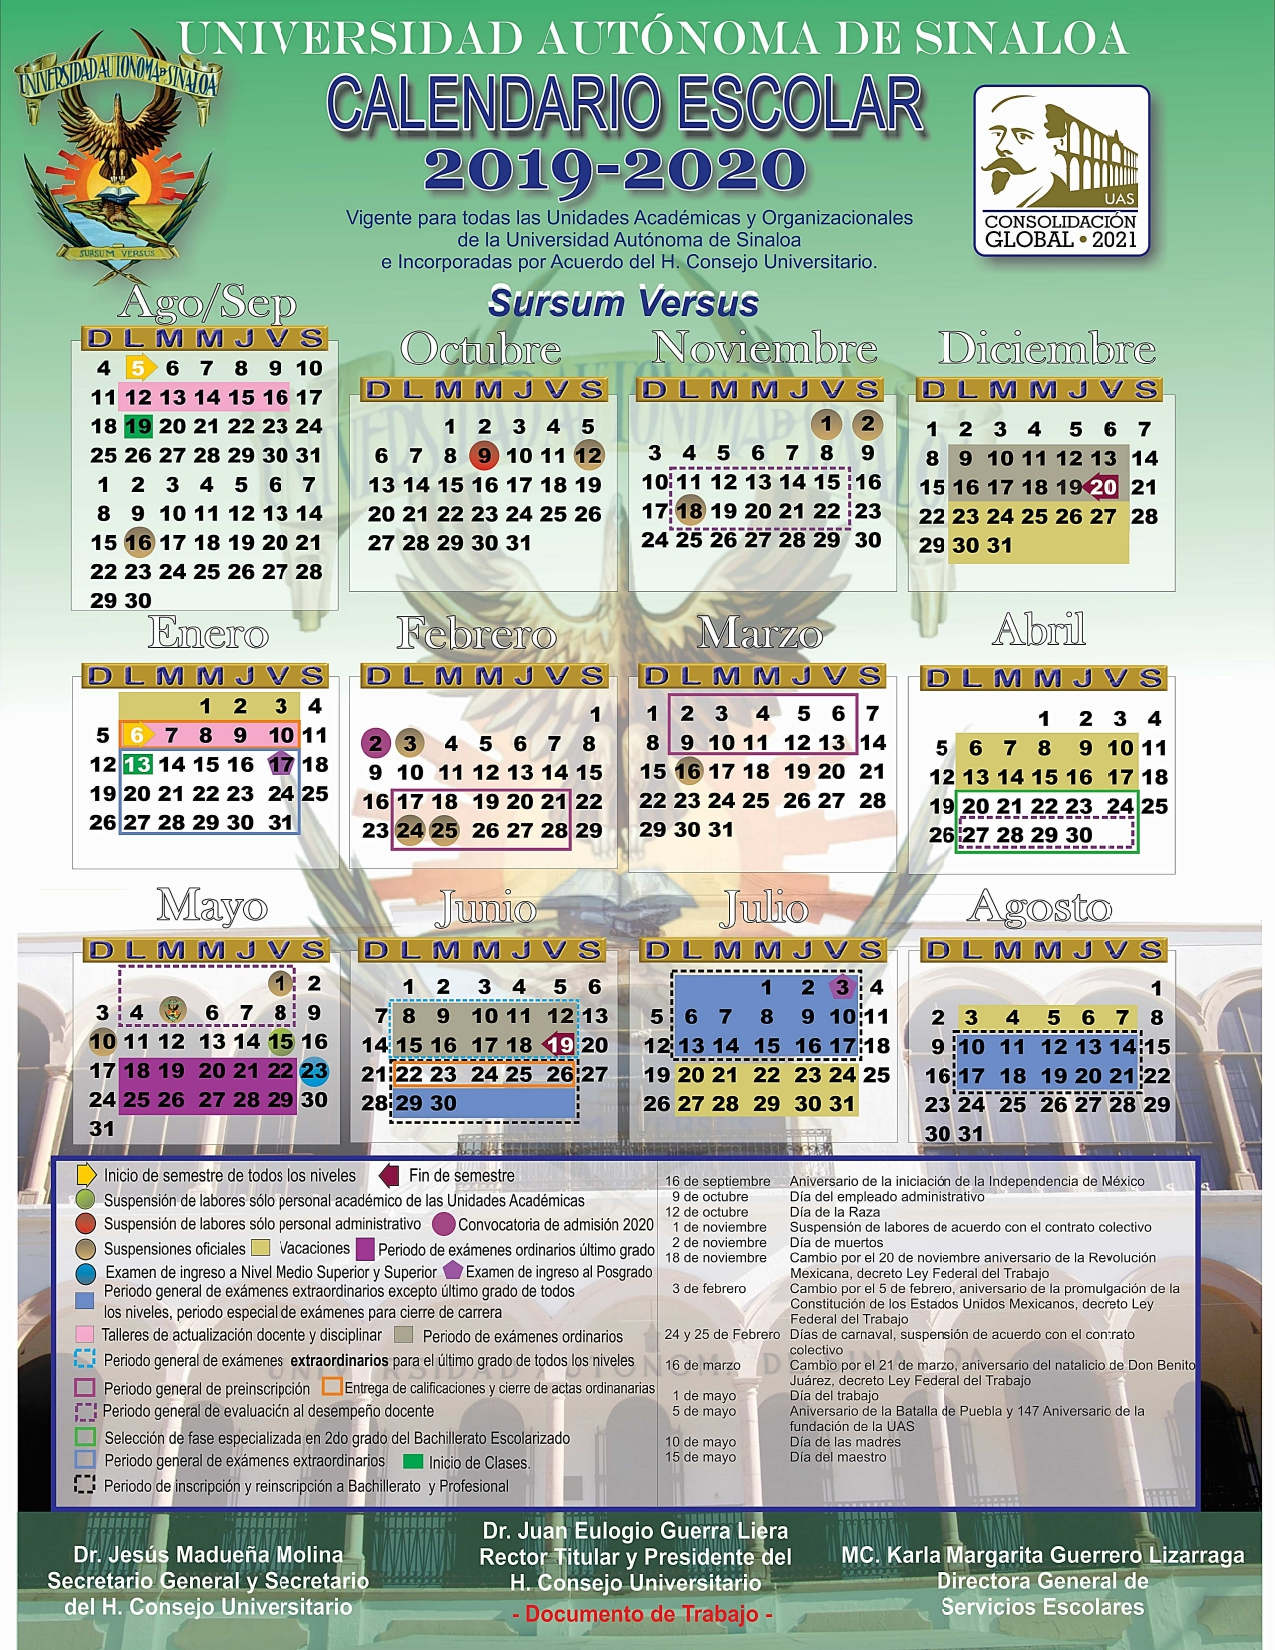 Calendario Universitario.Facultad De Medicina Calendario Universitario 2019 2020